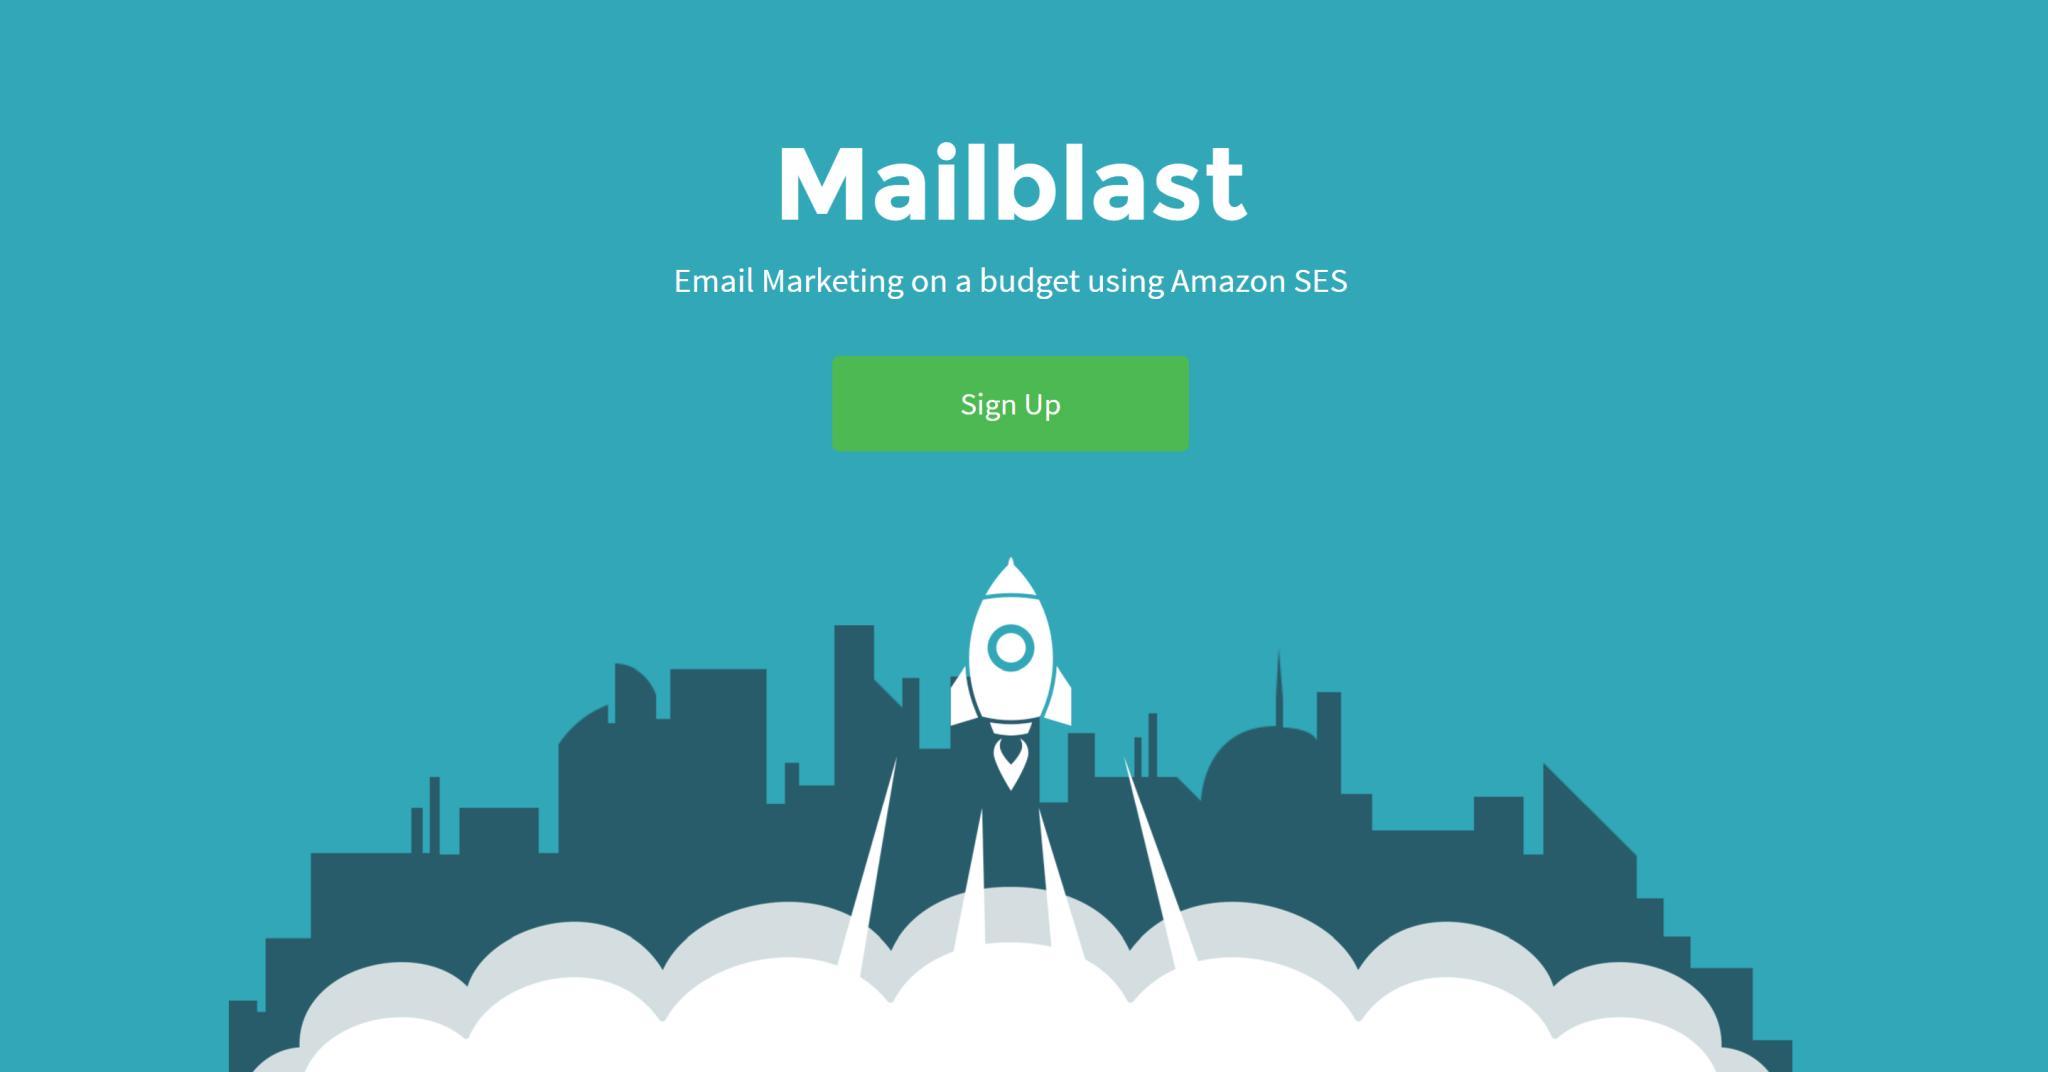 Mailblast